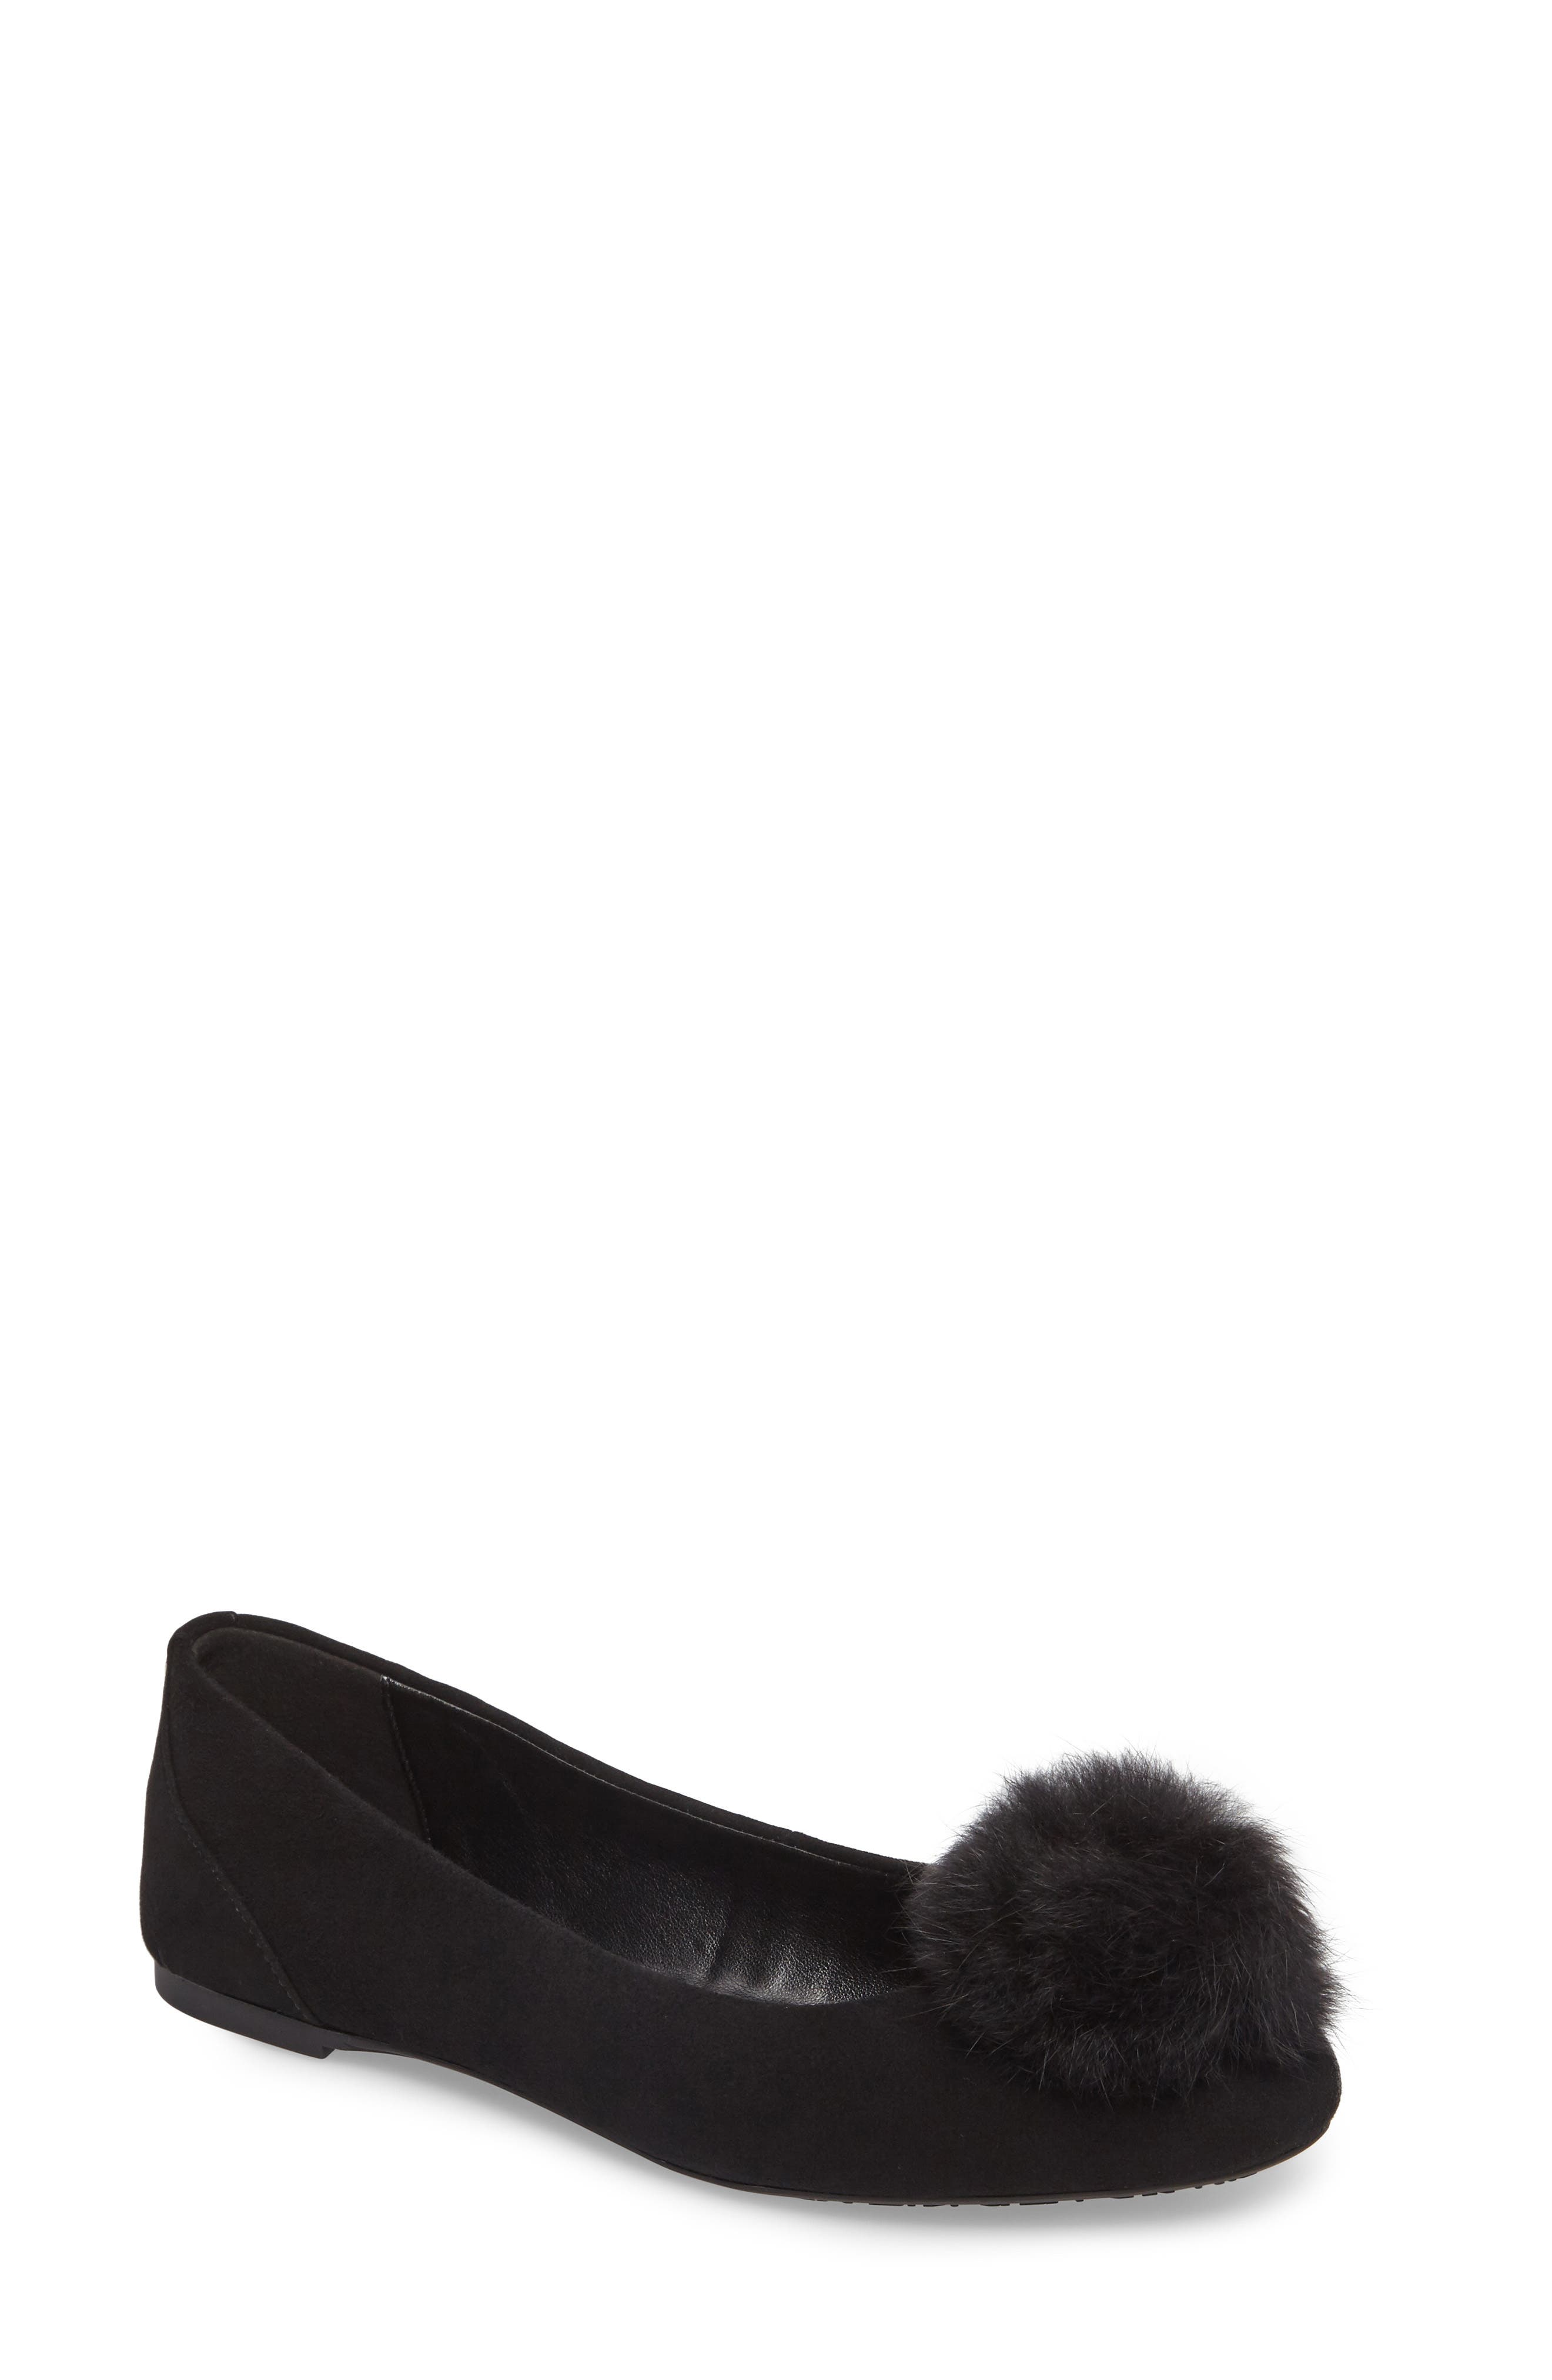 Remi Ballet Flat with Genuine Rabbit Fur Pom,                             Main thumbnail 1, color,                             001